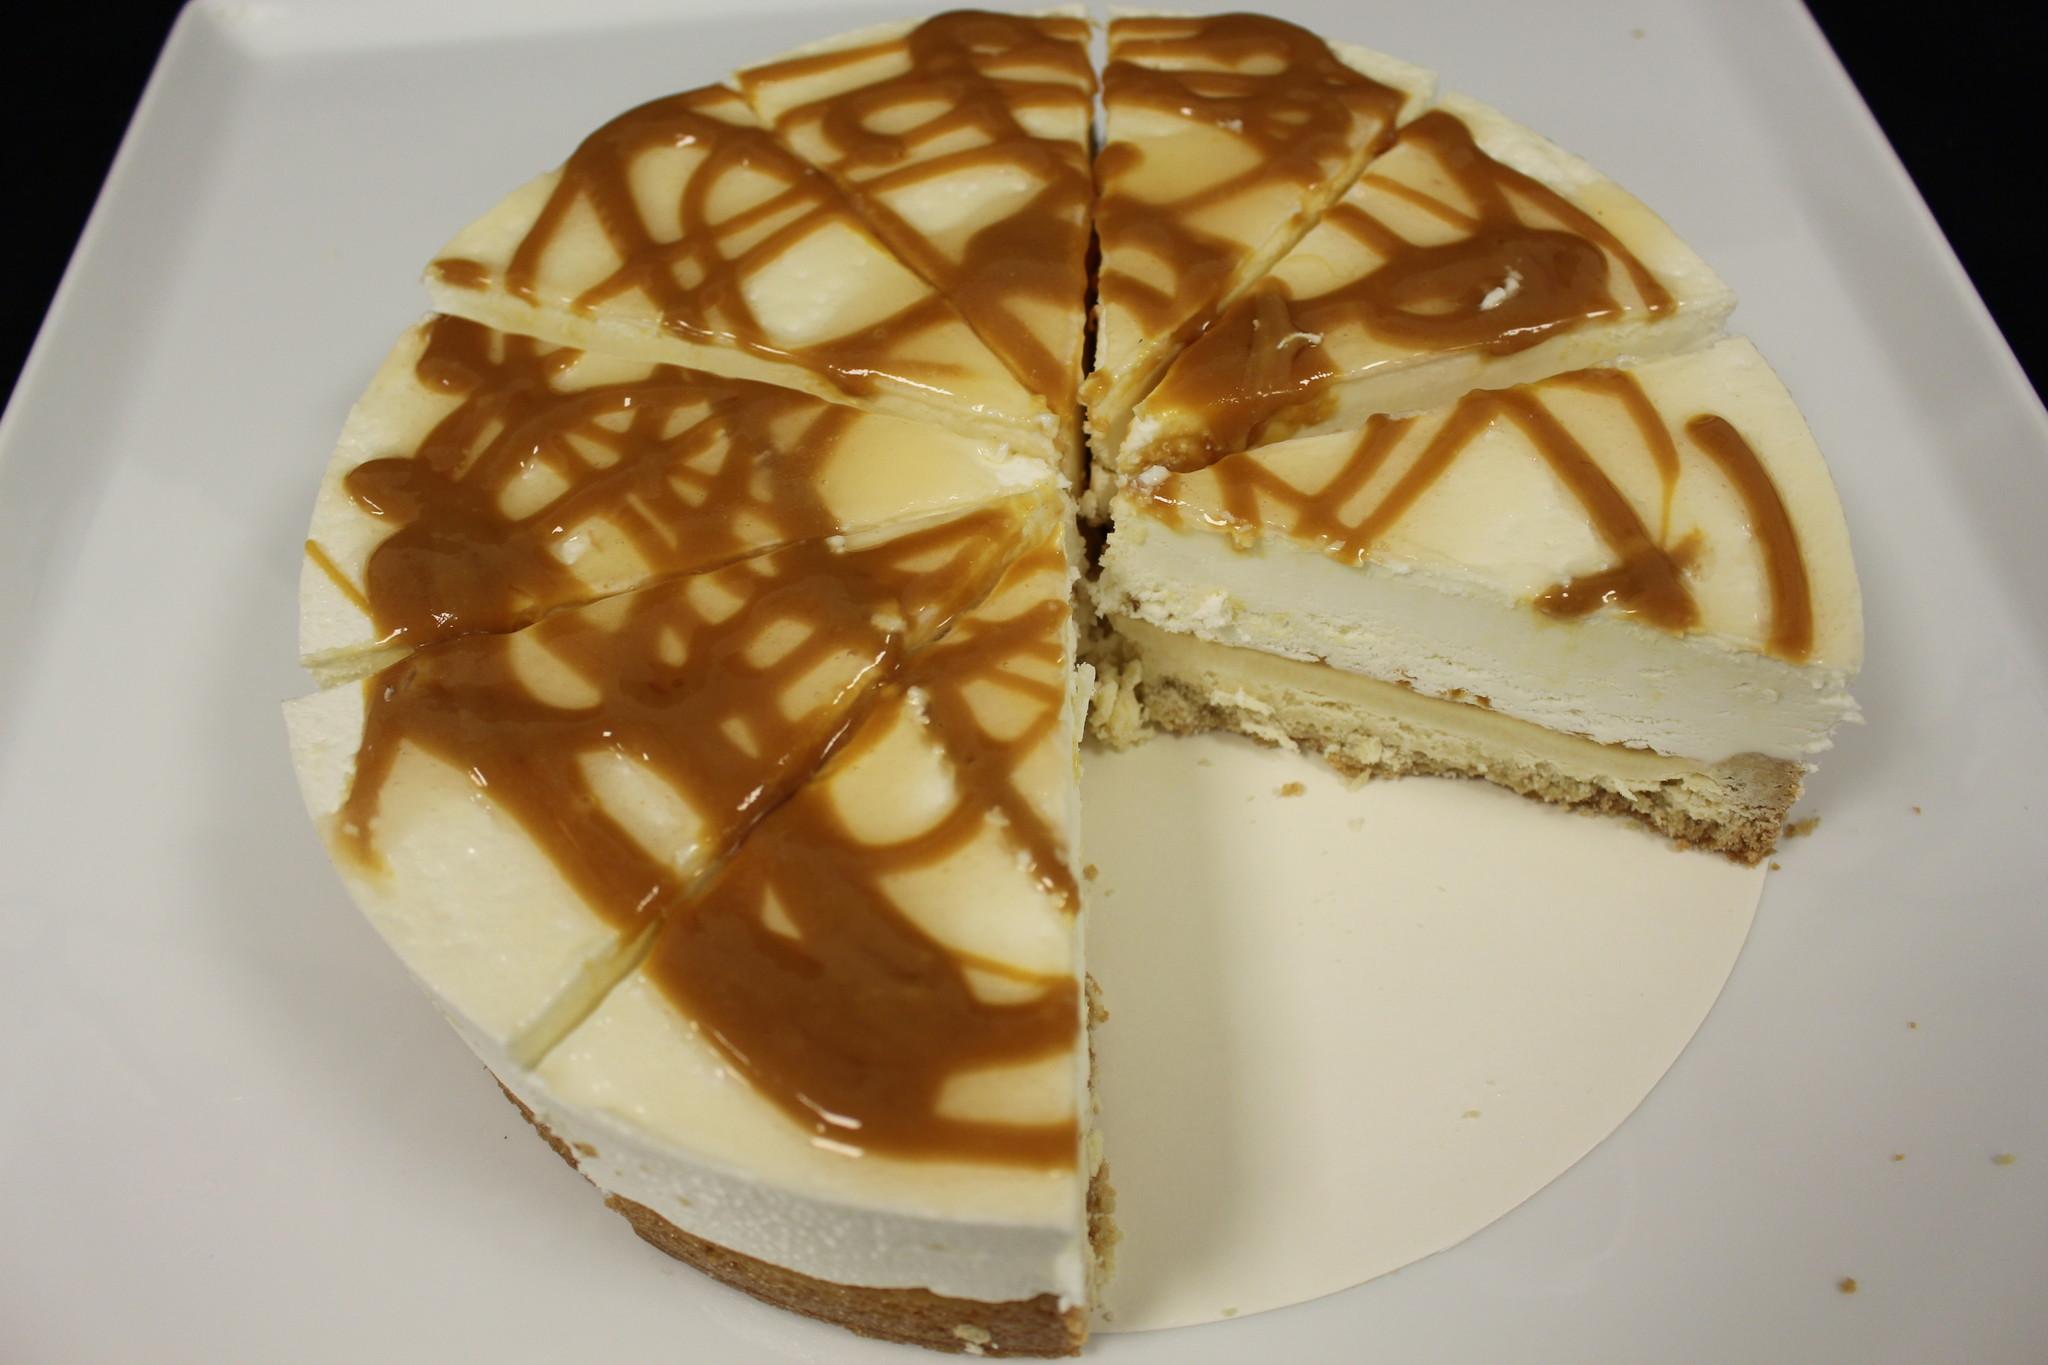 Cheesecake Salted Caramel 2145929